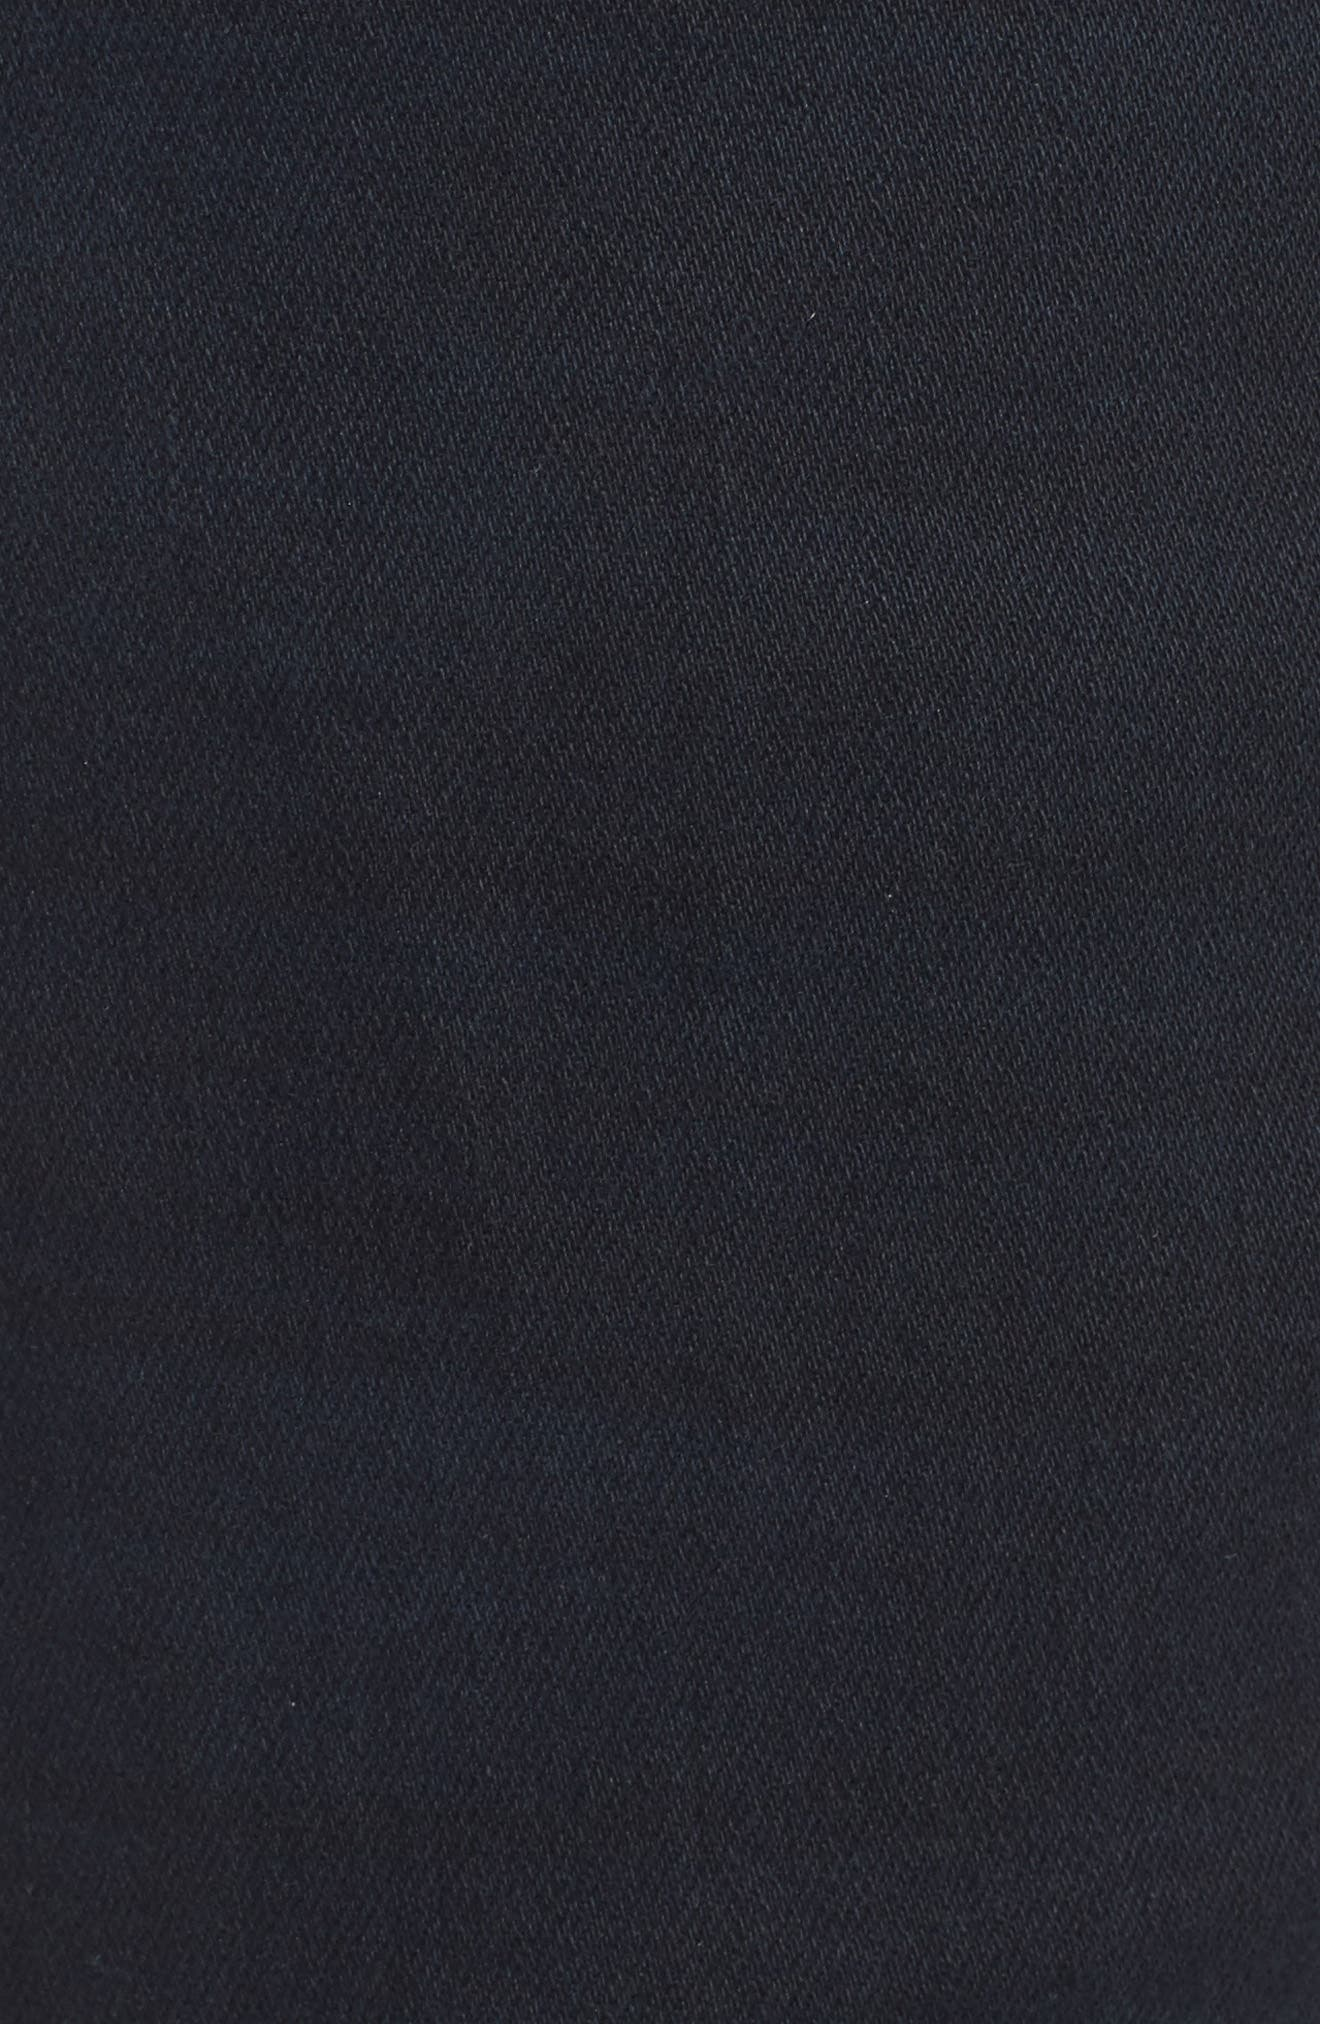 Gage Slim Straight Leg Jeans,                             Alternate thumbnail 5, color,                             401